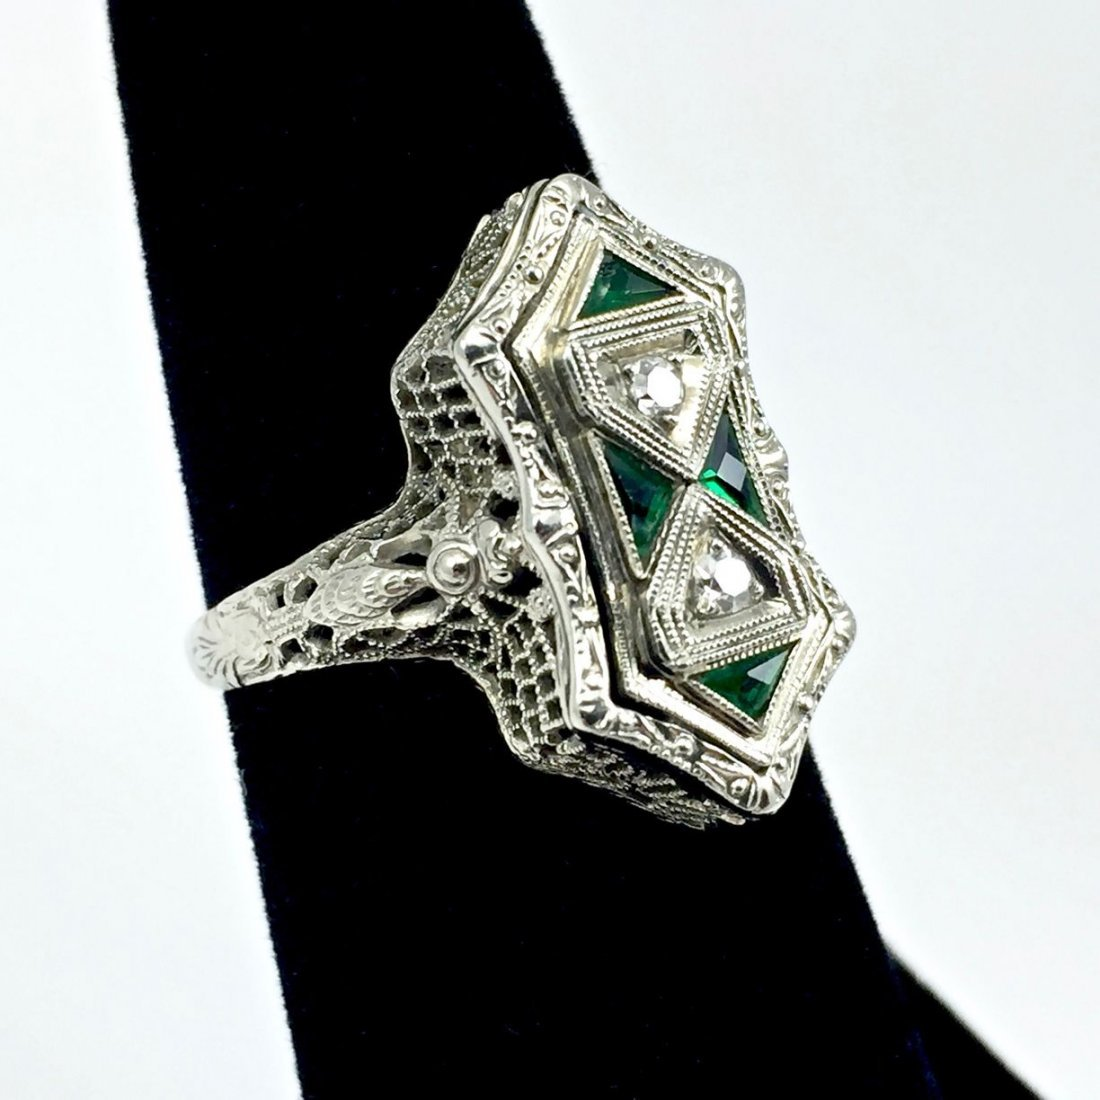 Art Deco Belais 14k Filigree Dragonfly Ring